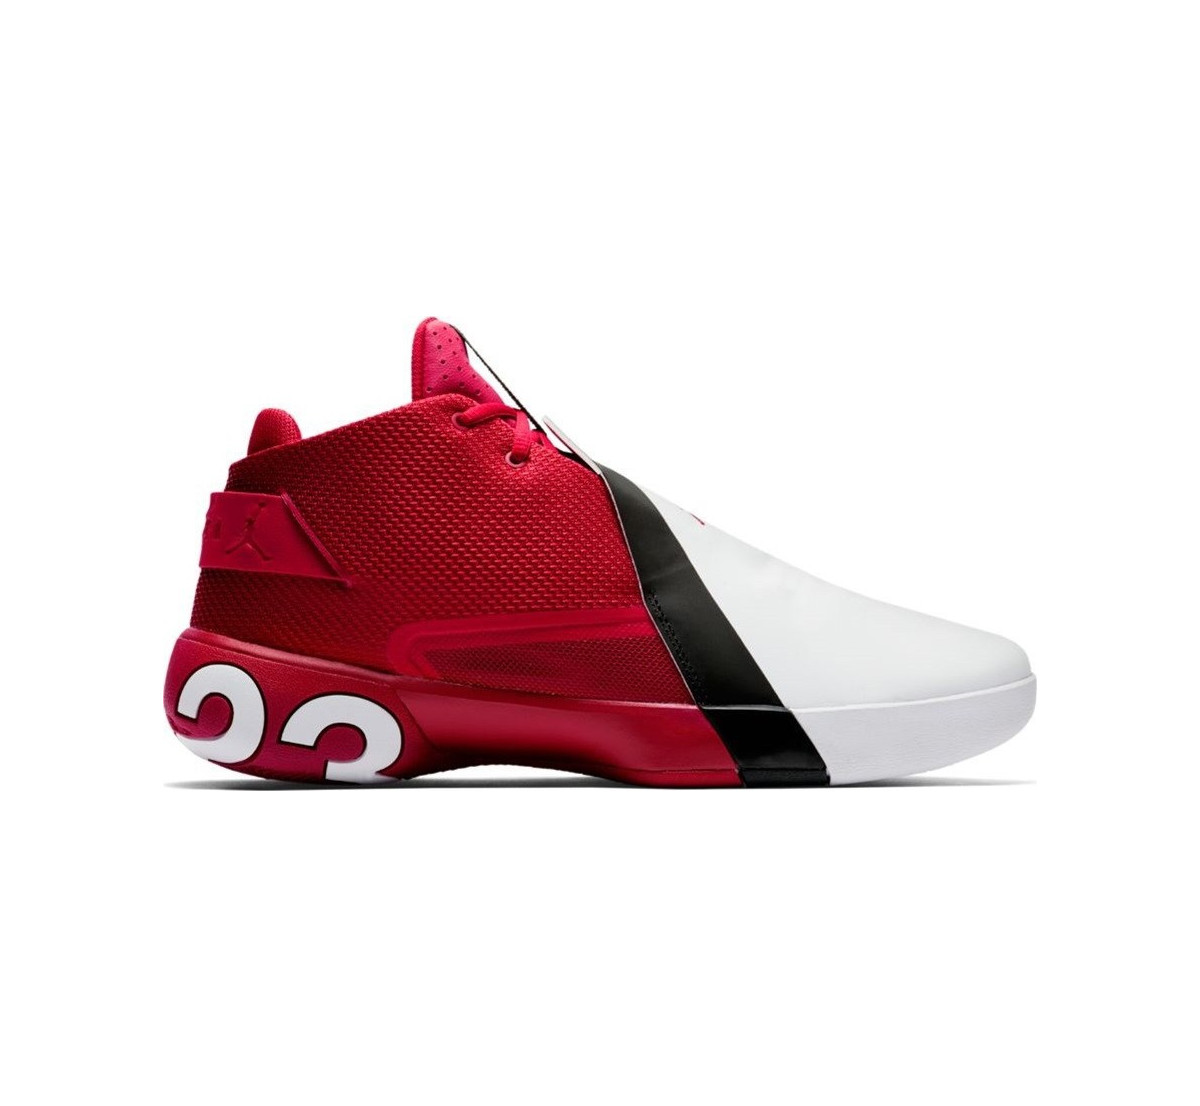 6a504040a5d Ανδρικά Αθλητικά Παπούτσια Κόκκινο   BestPrice.gr